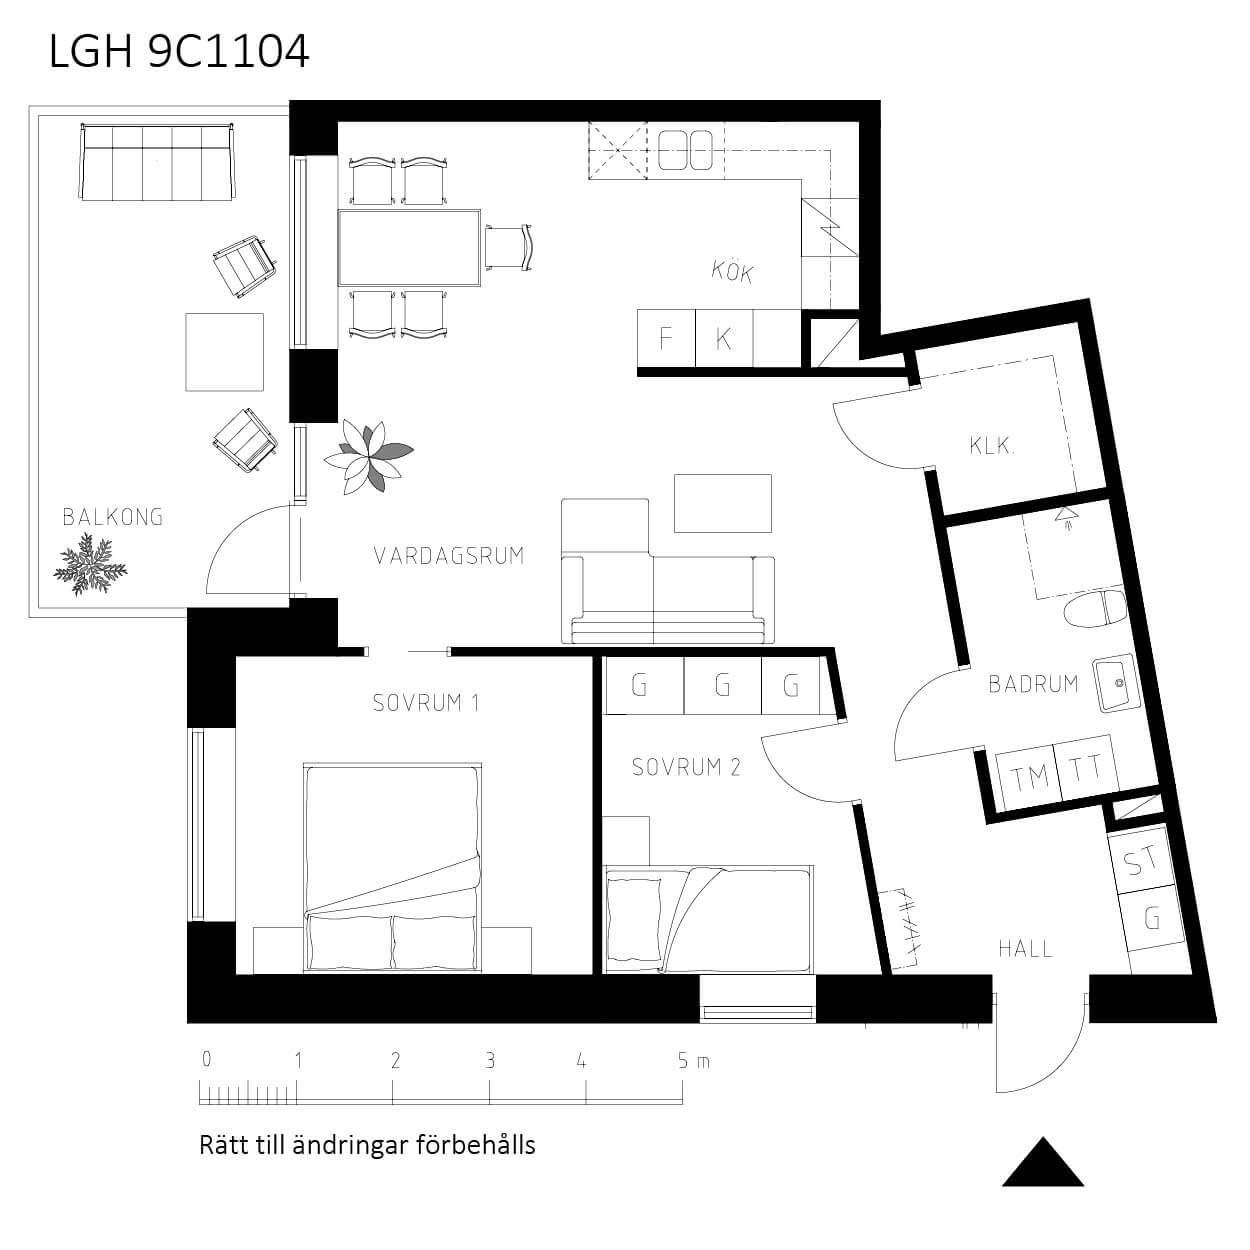 lgh_9C1104